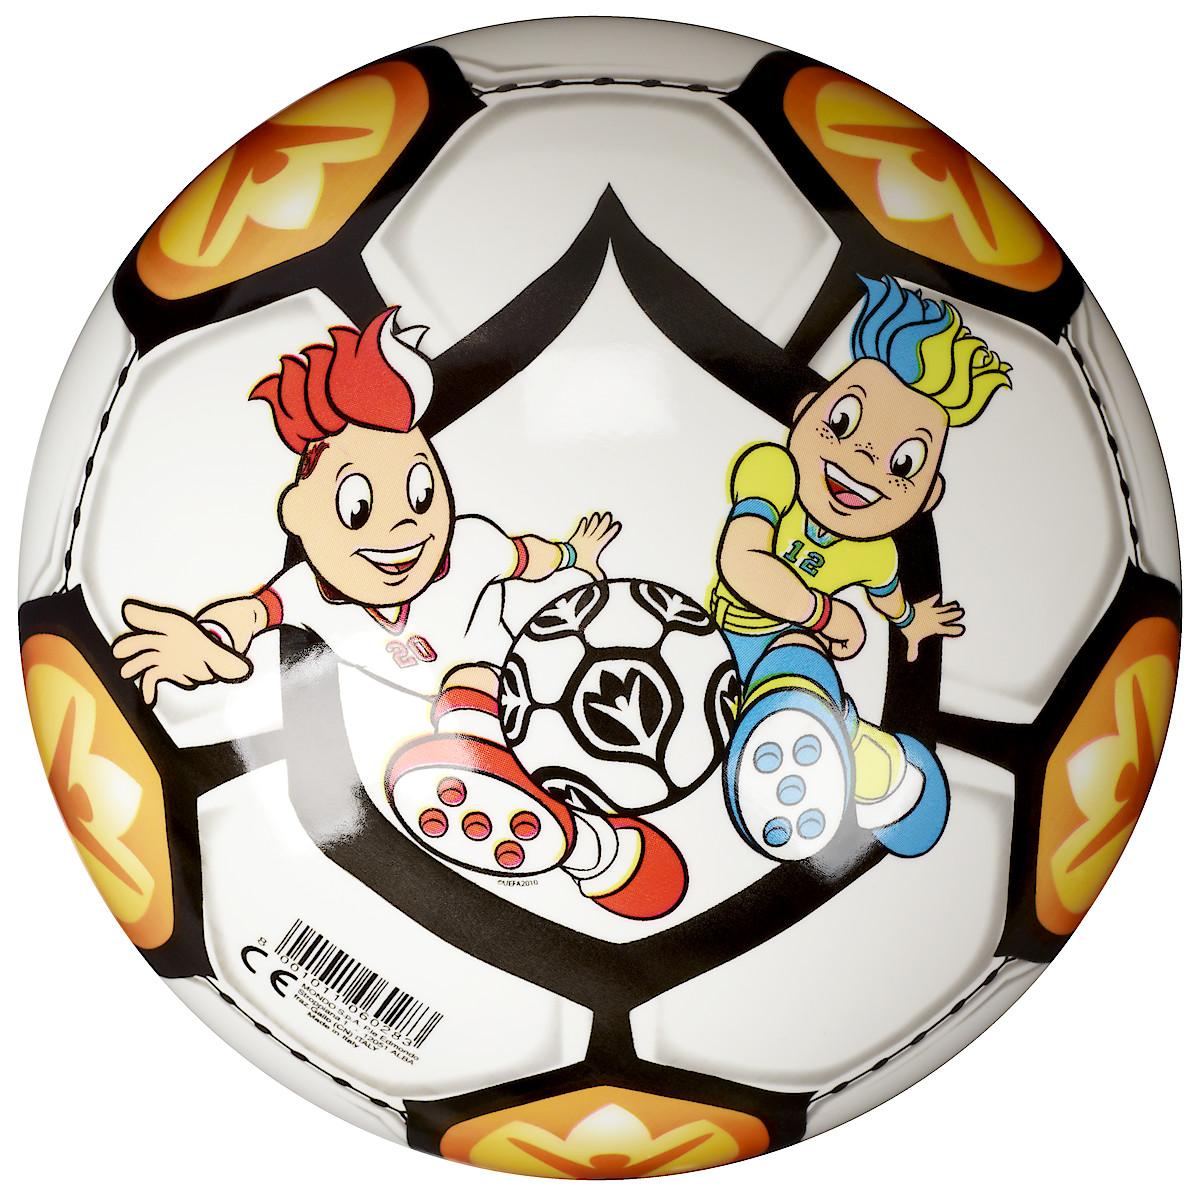 UEFA toy football